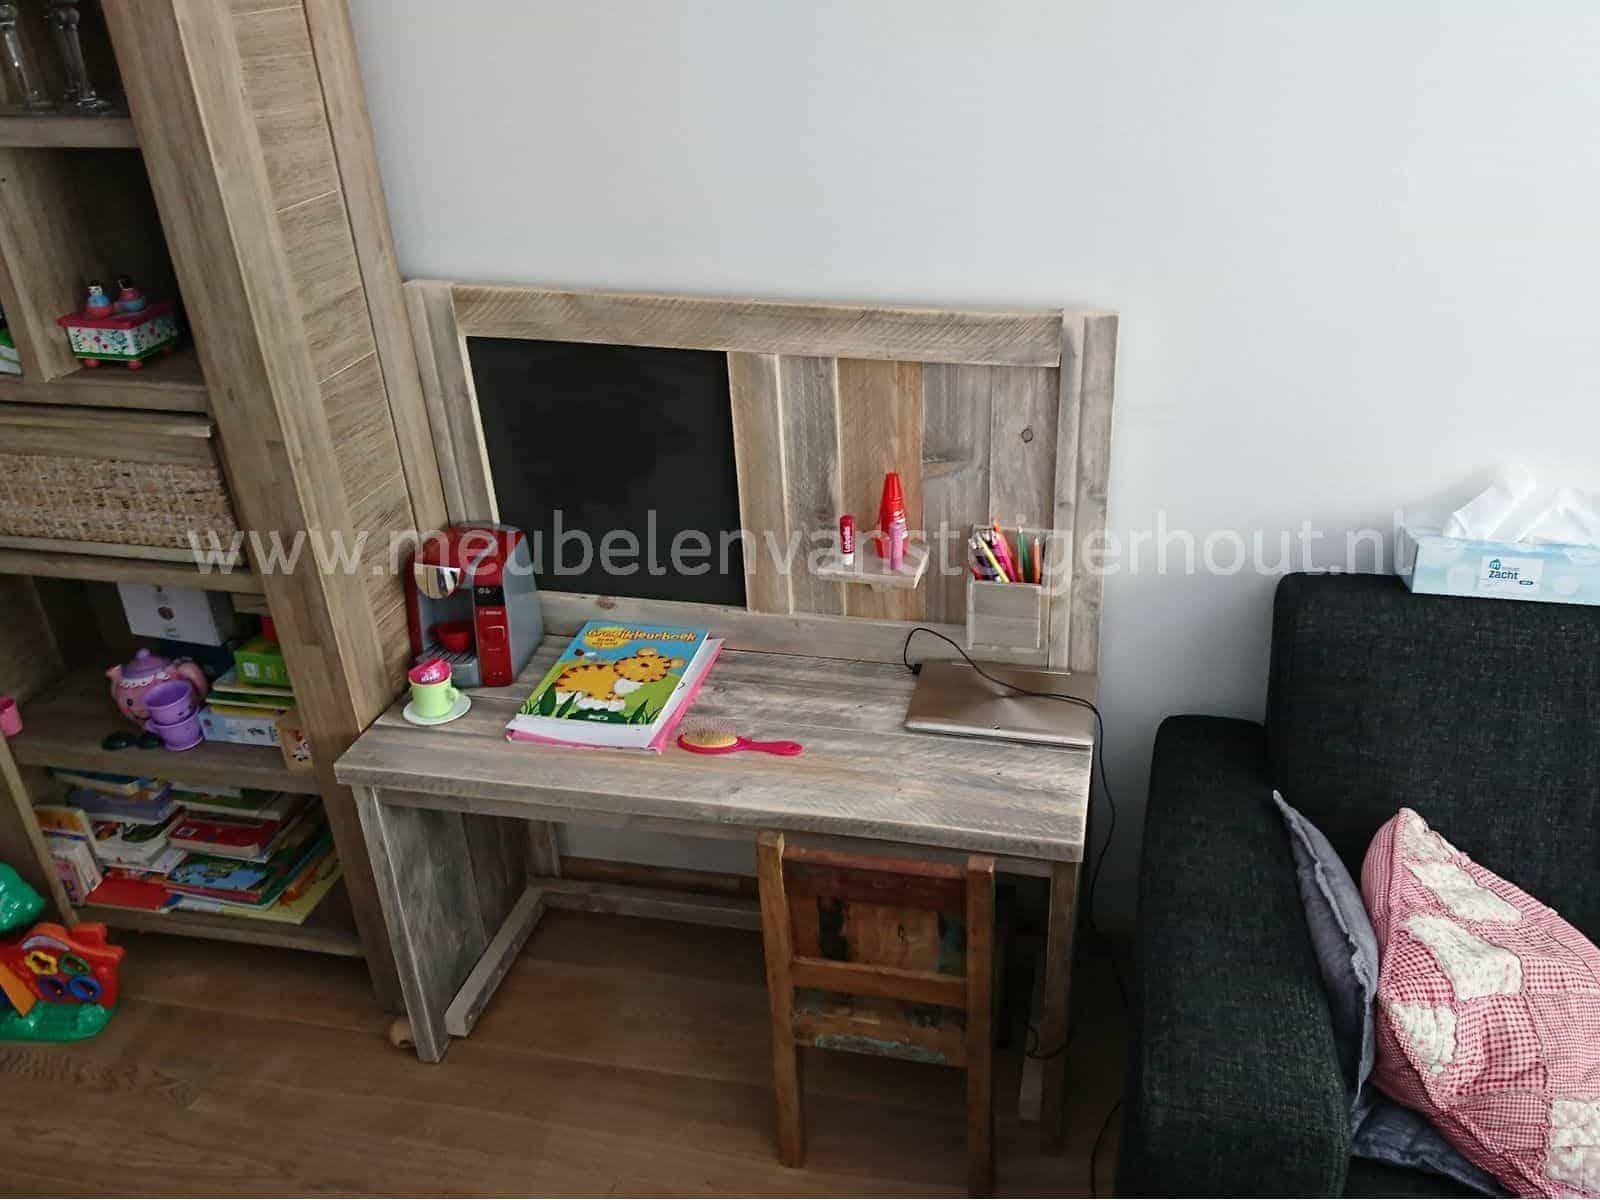 ikea magneetbord ikea bestellen een with ikea magneetbord besta regal ikea einzigartig pimp. Black Bedroom Furniture Sets. Home Design Ideas